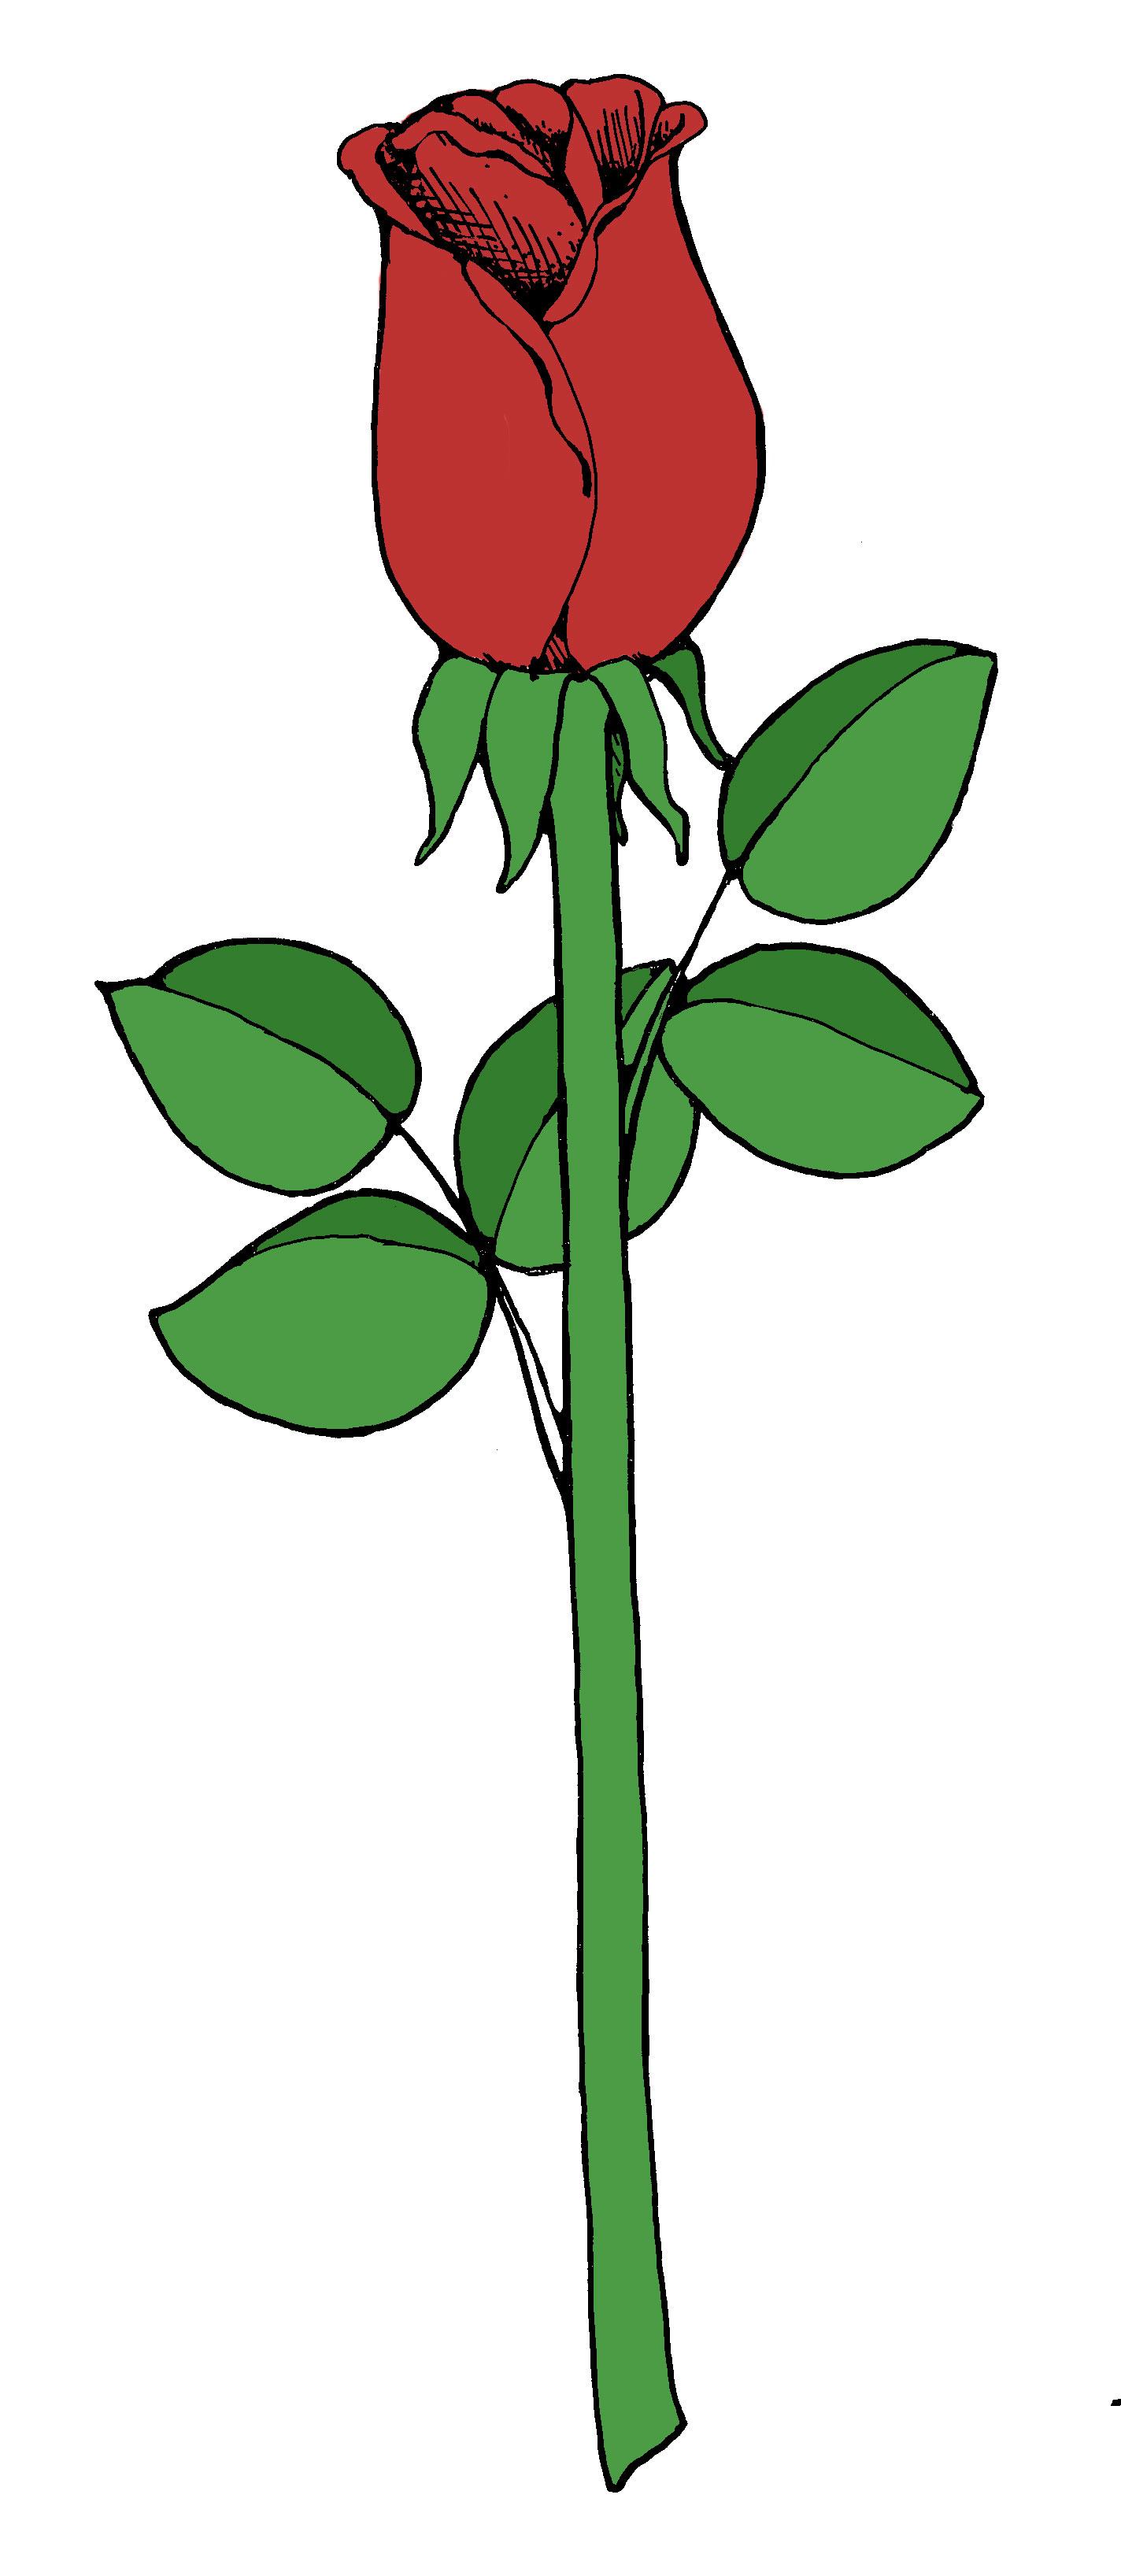 1424x3272 Simple Clipart Rose Amp Simple Clip Art Rose Images